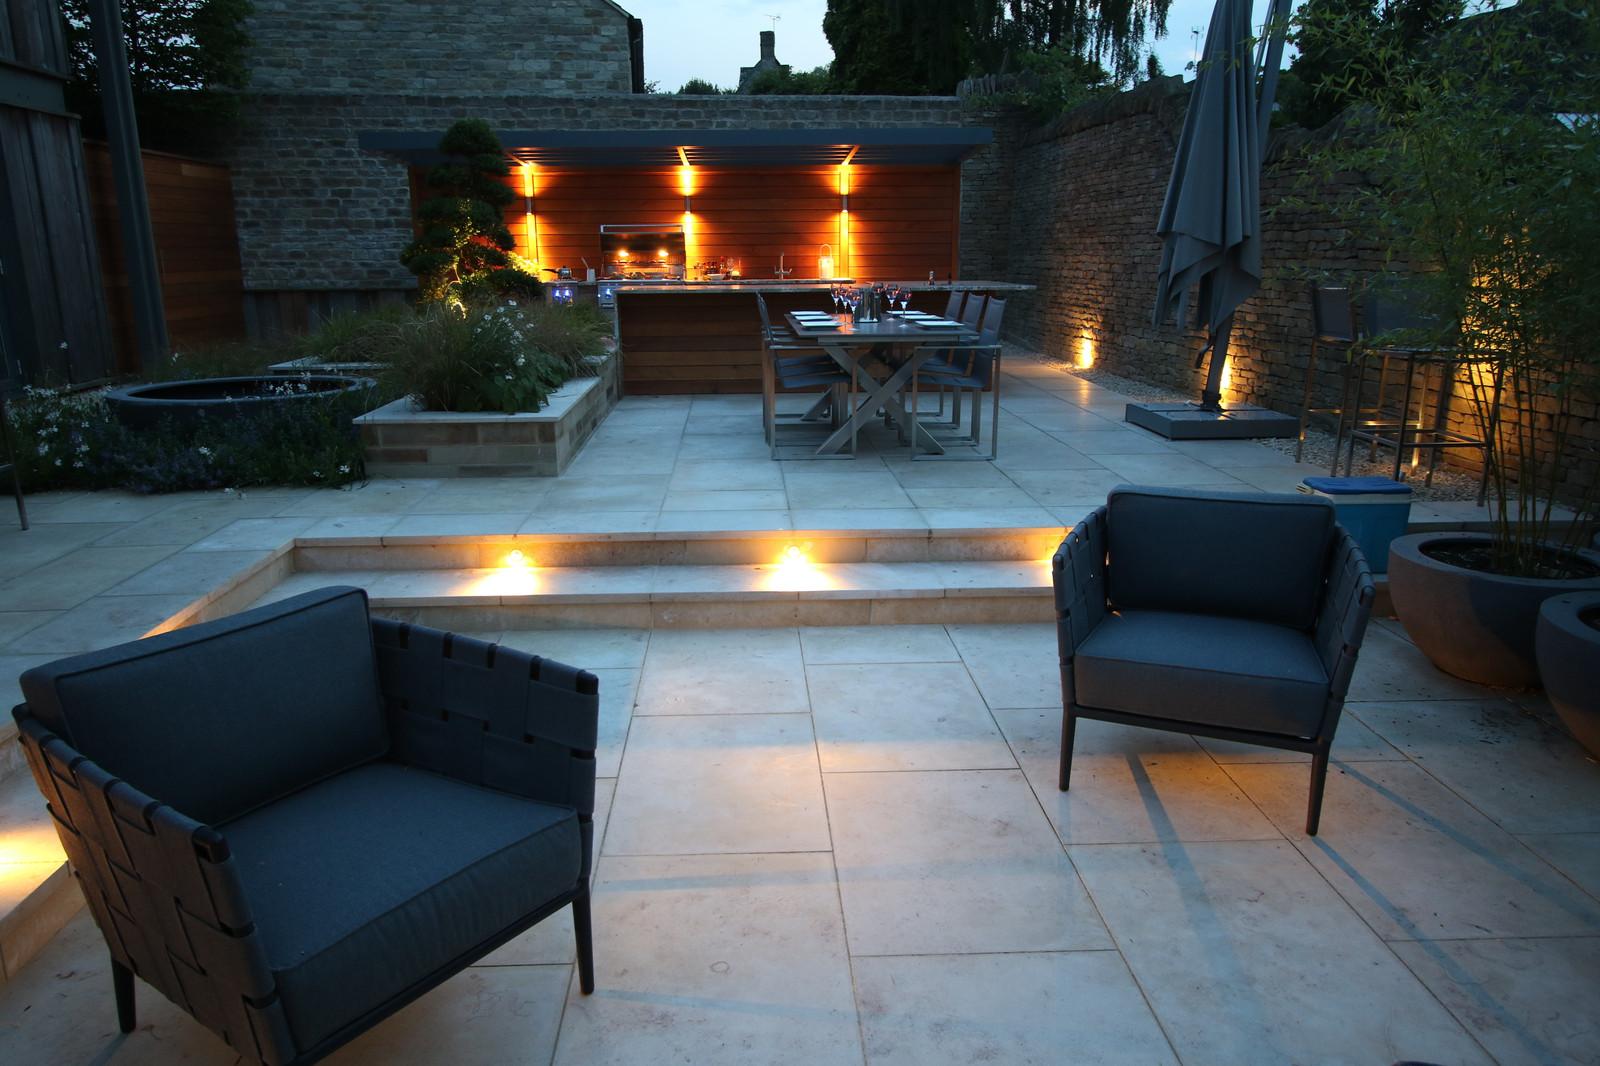 Outdoor Kitchen Design |Cotswolds | Outdoor Kitchens & Design